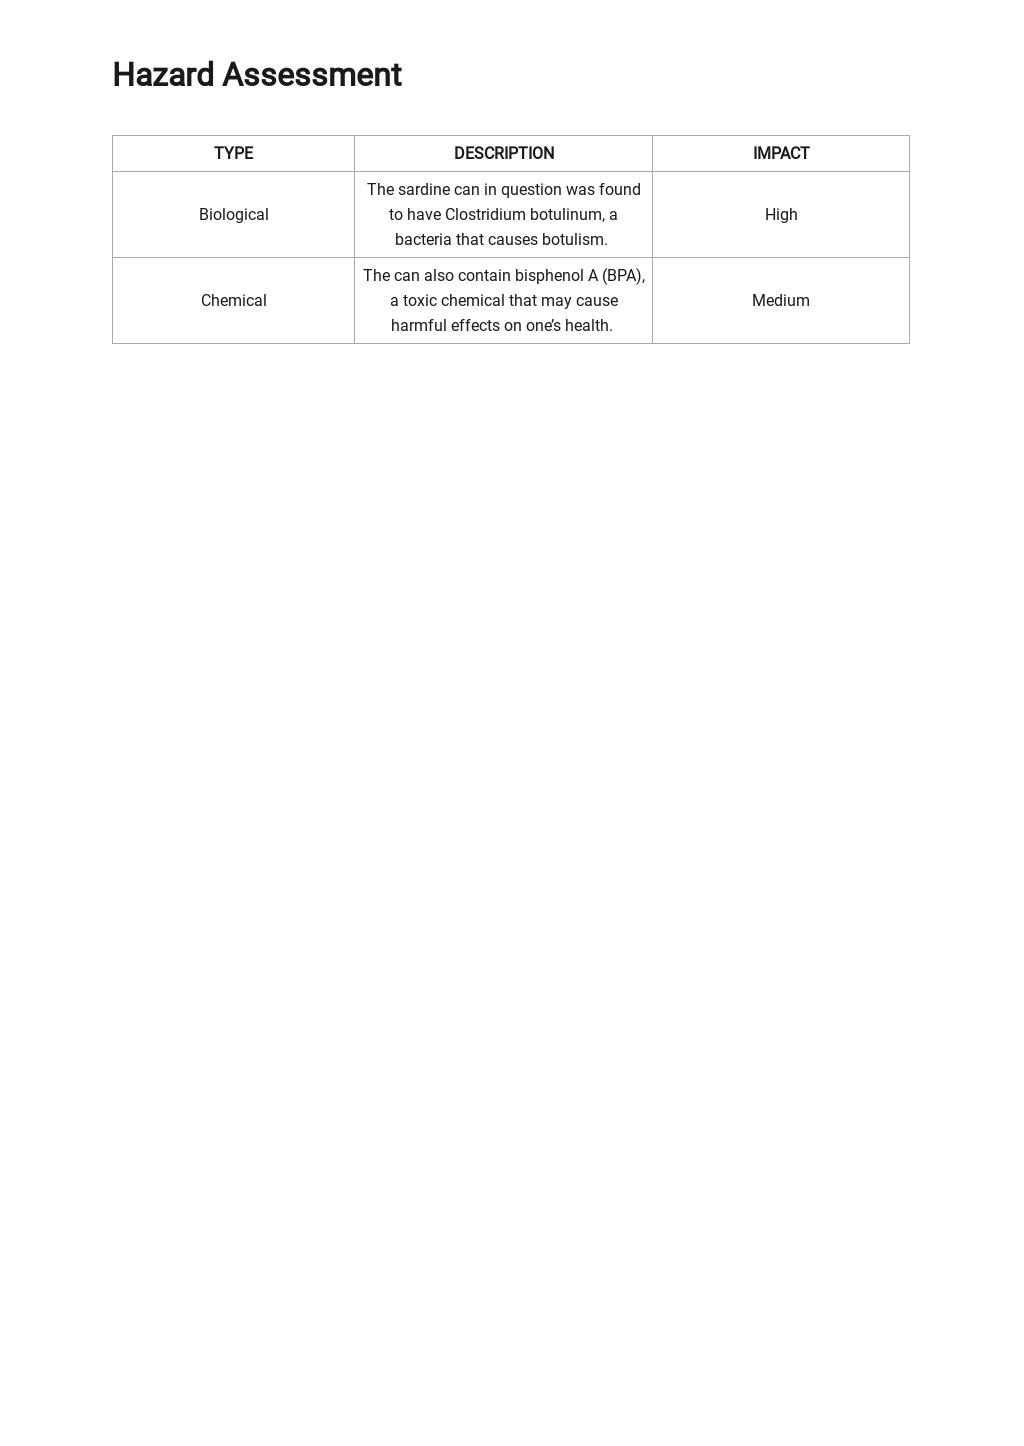 Hazard Analysis Template 2.jpe